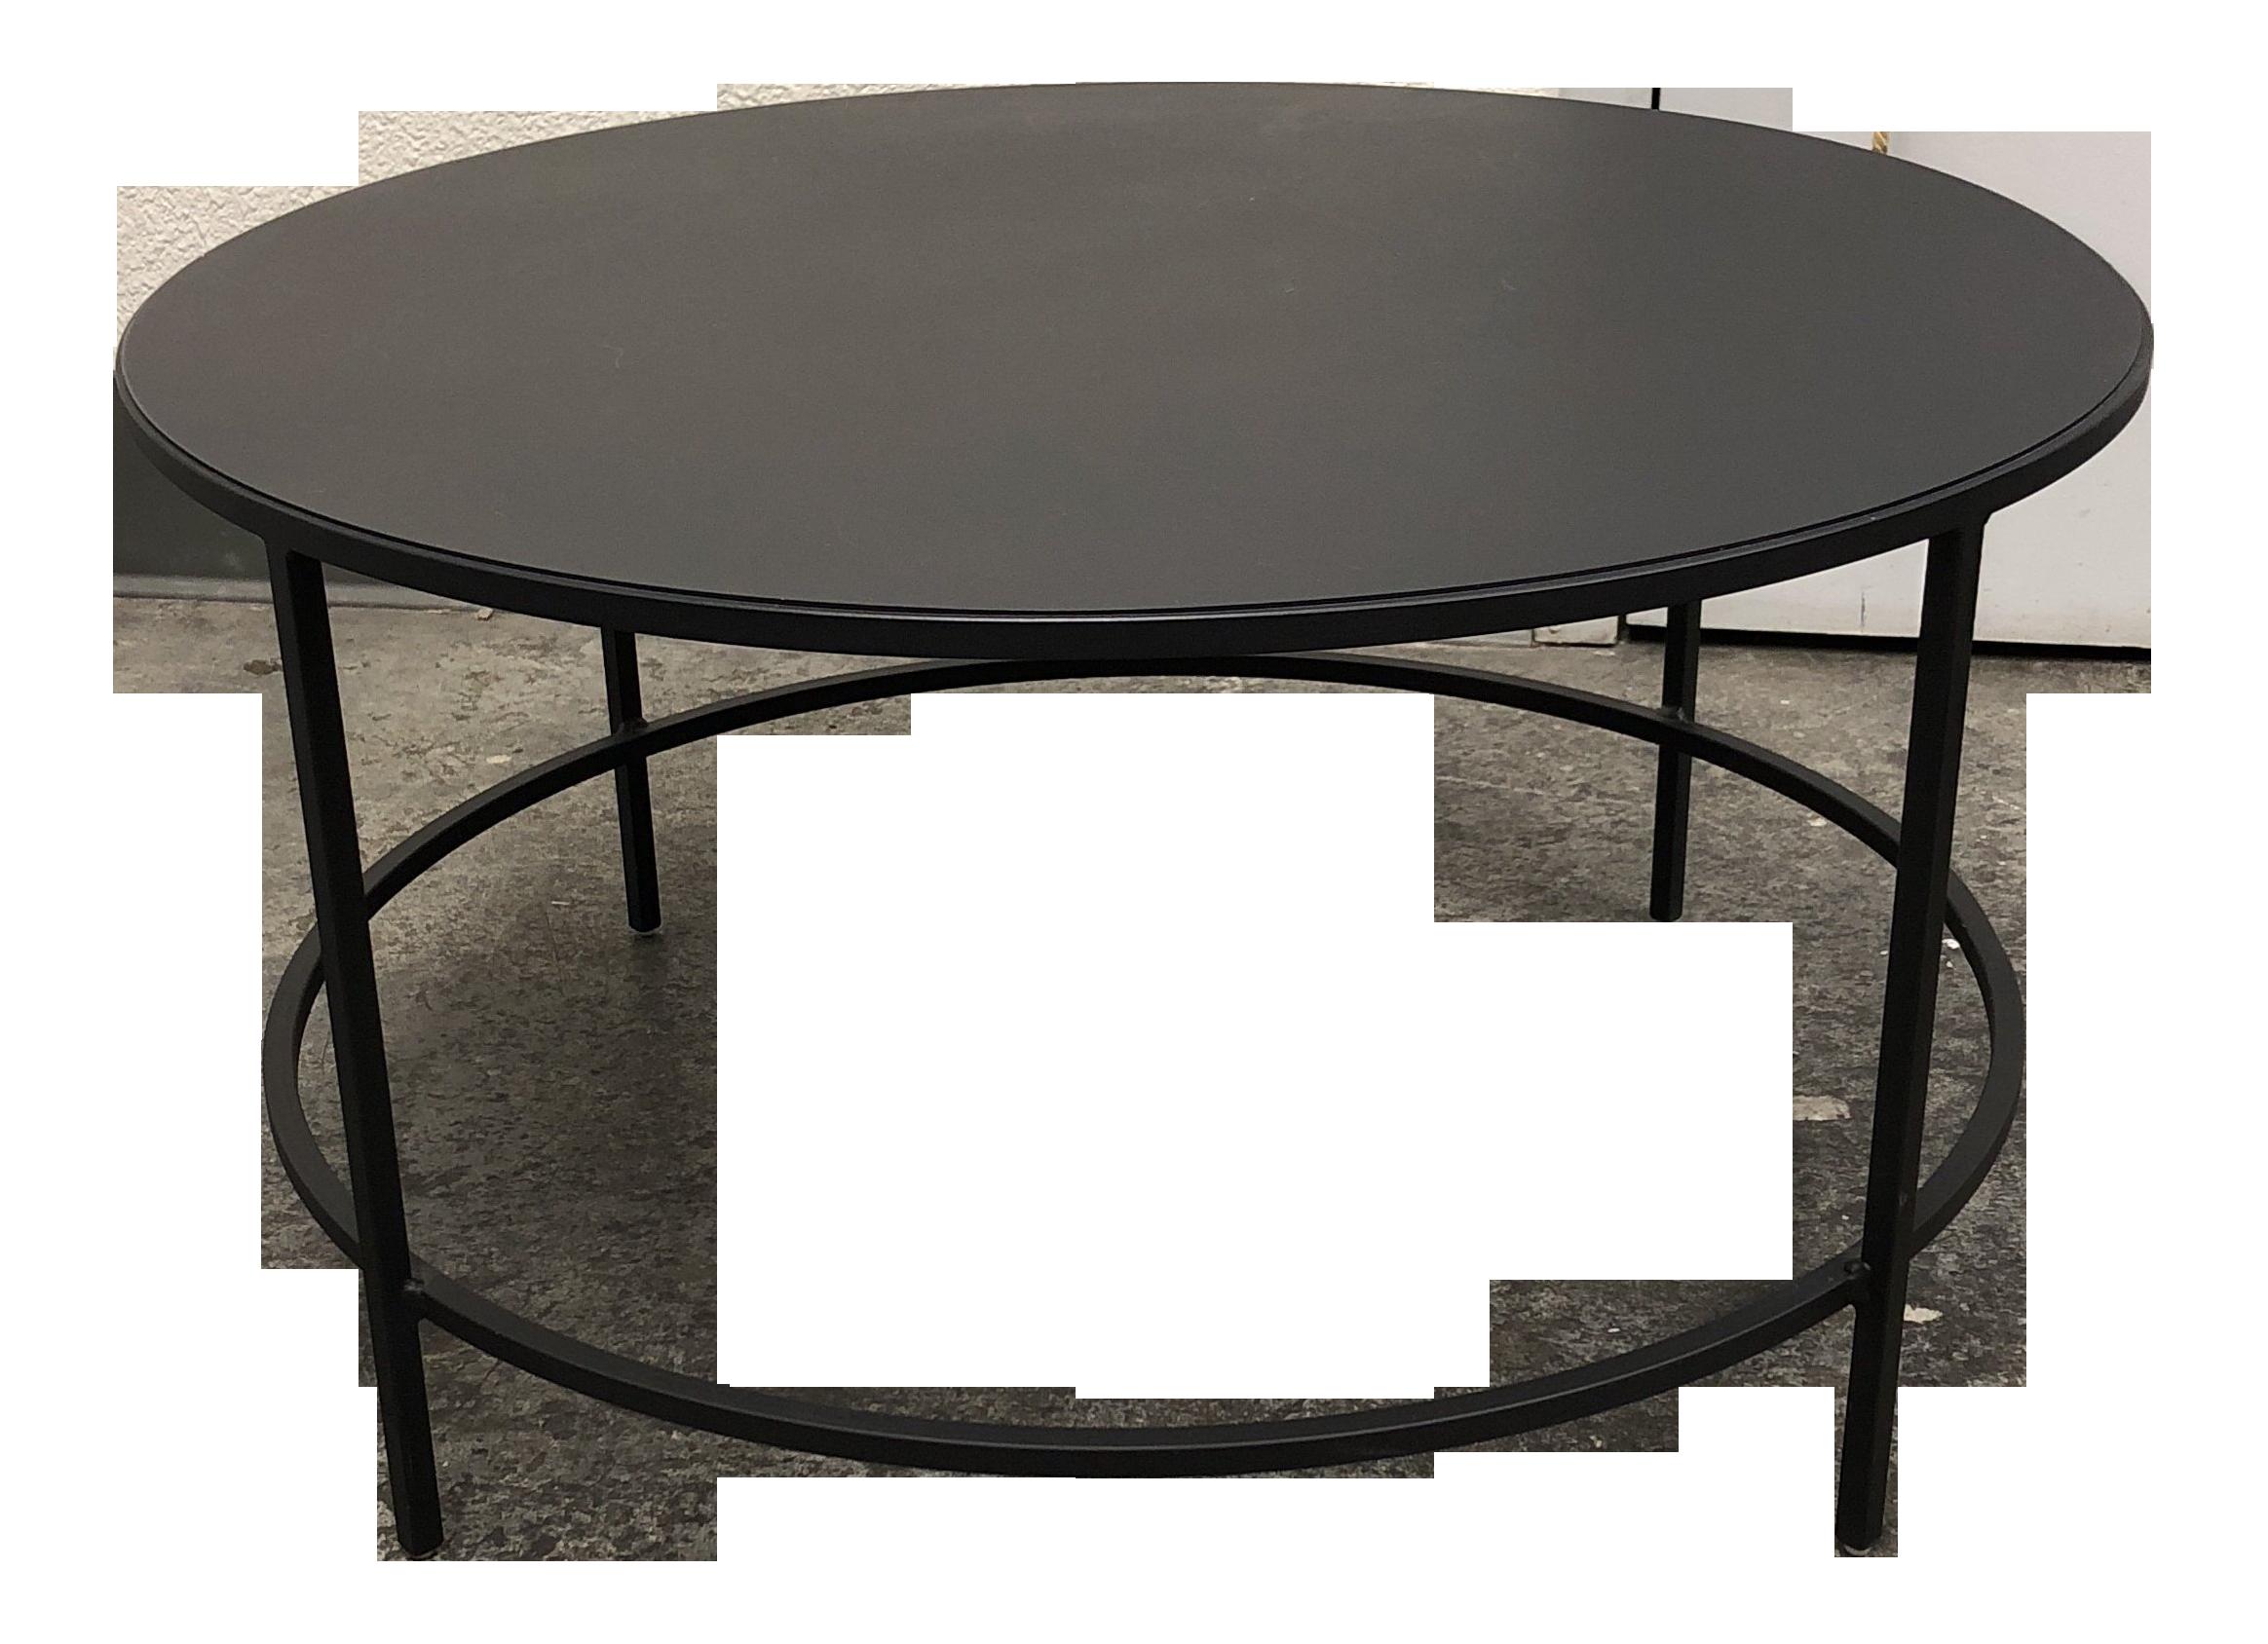 Rustic Room U0026 Board Round Steel Coffee Table